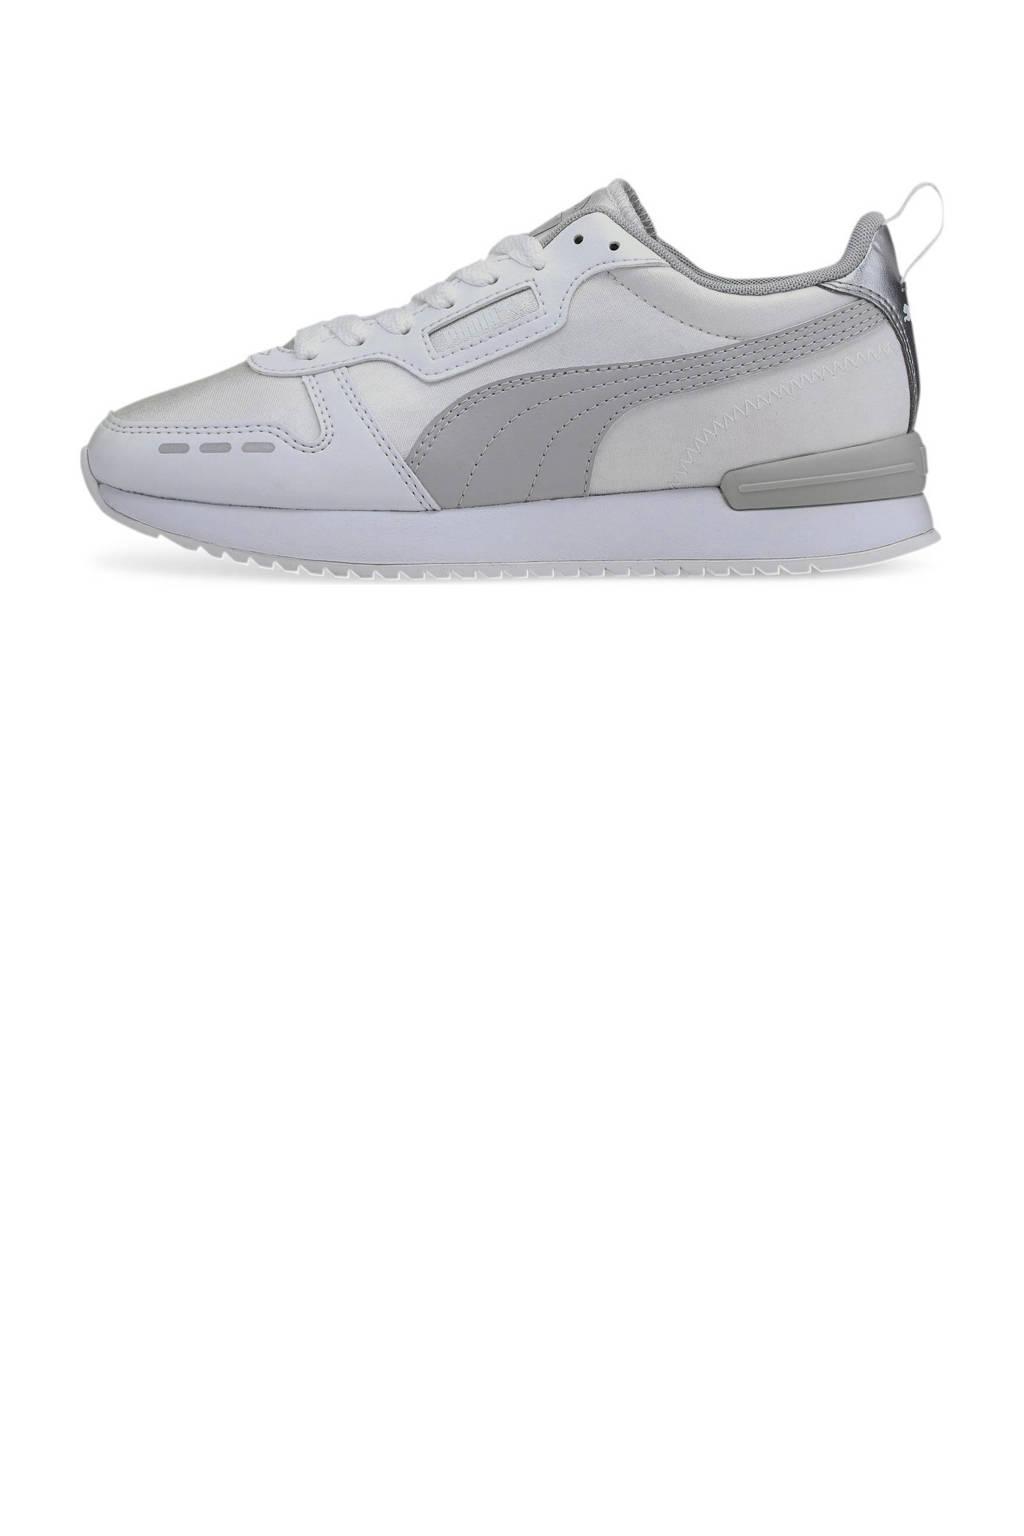 Puma R78 Metallic sneakers wit/lichtgrijs, Wit/lichtgrijs